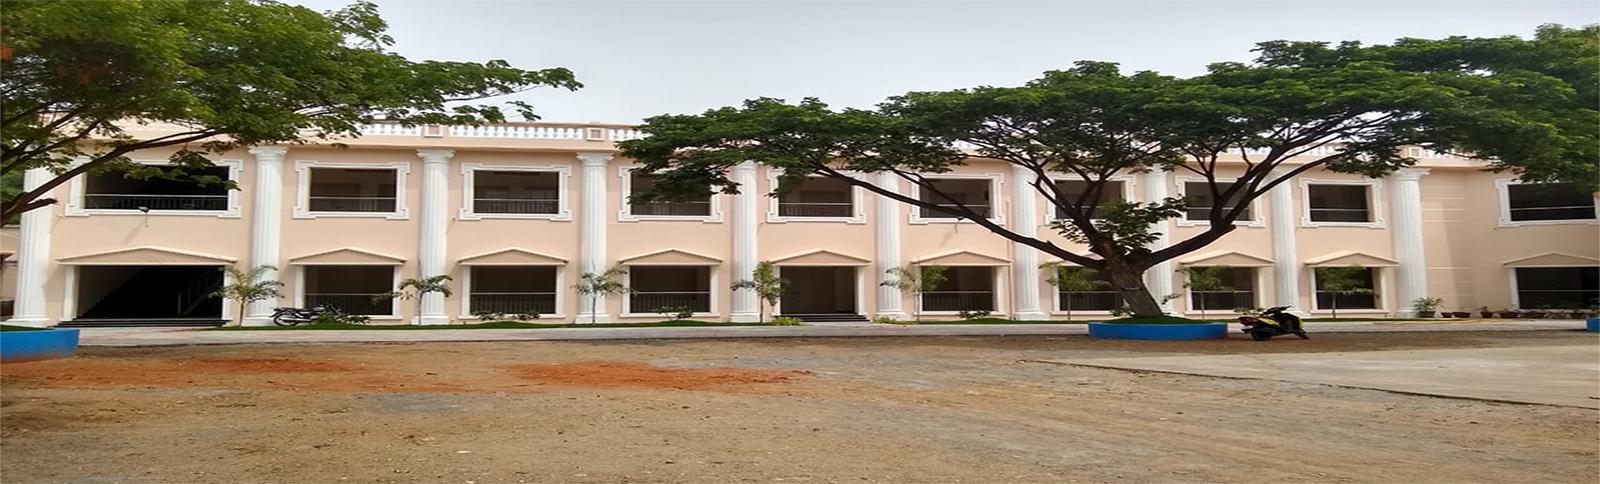 Jayarani Arts and Science College, Salem Image